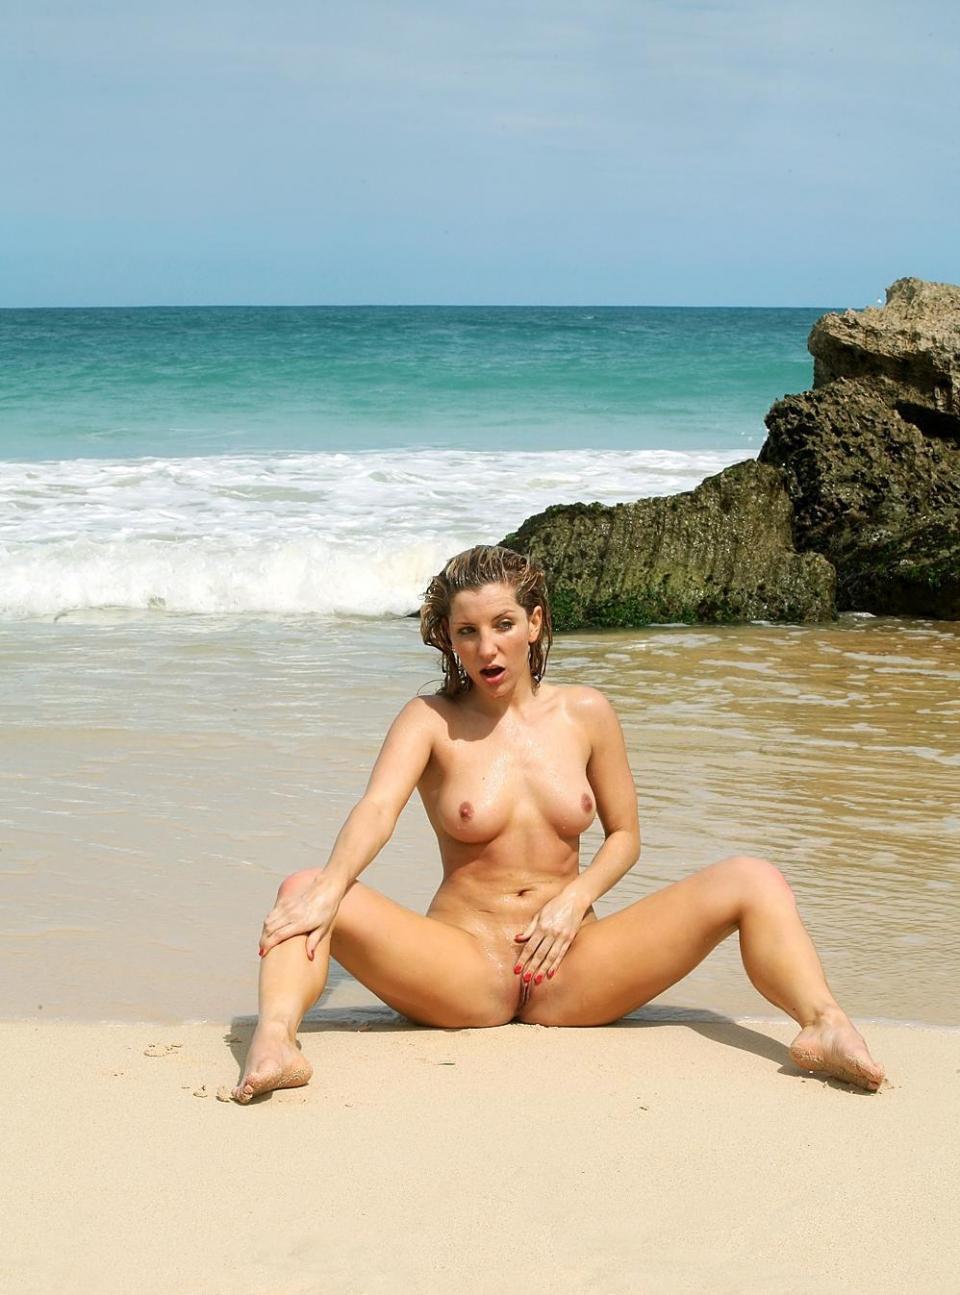 Small tits amature nude